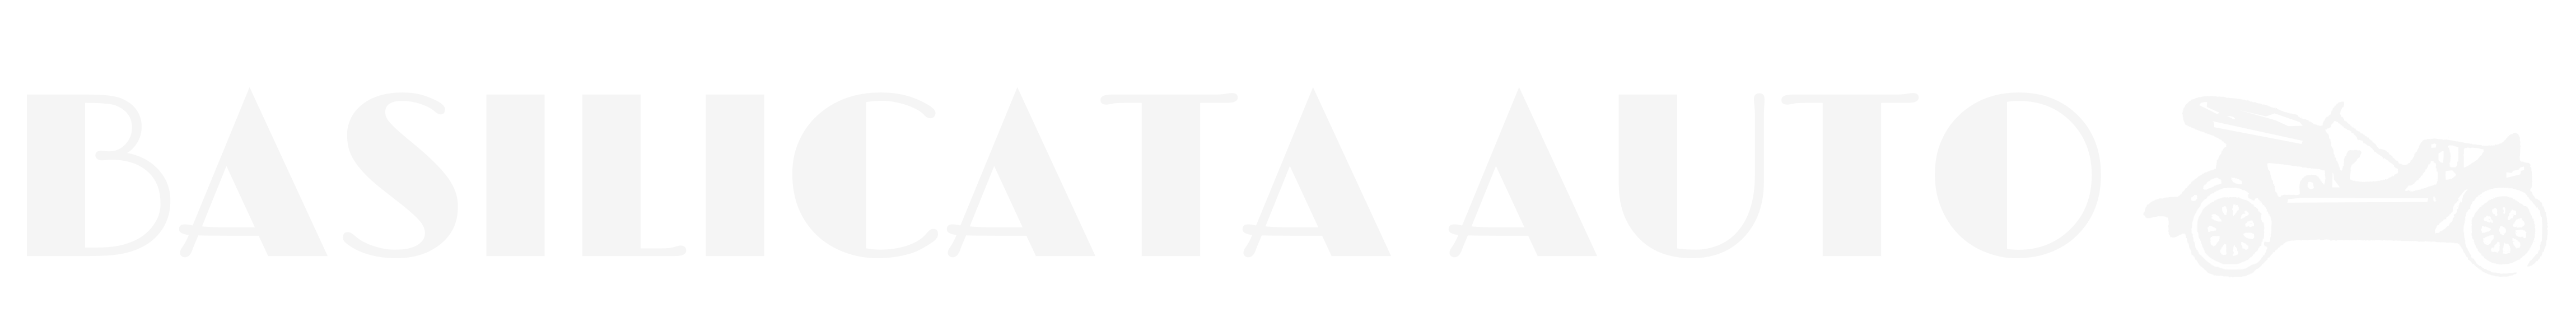 Basilicata Auto